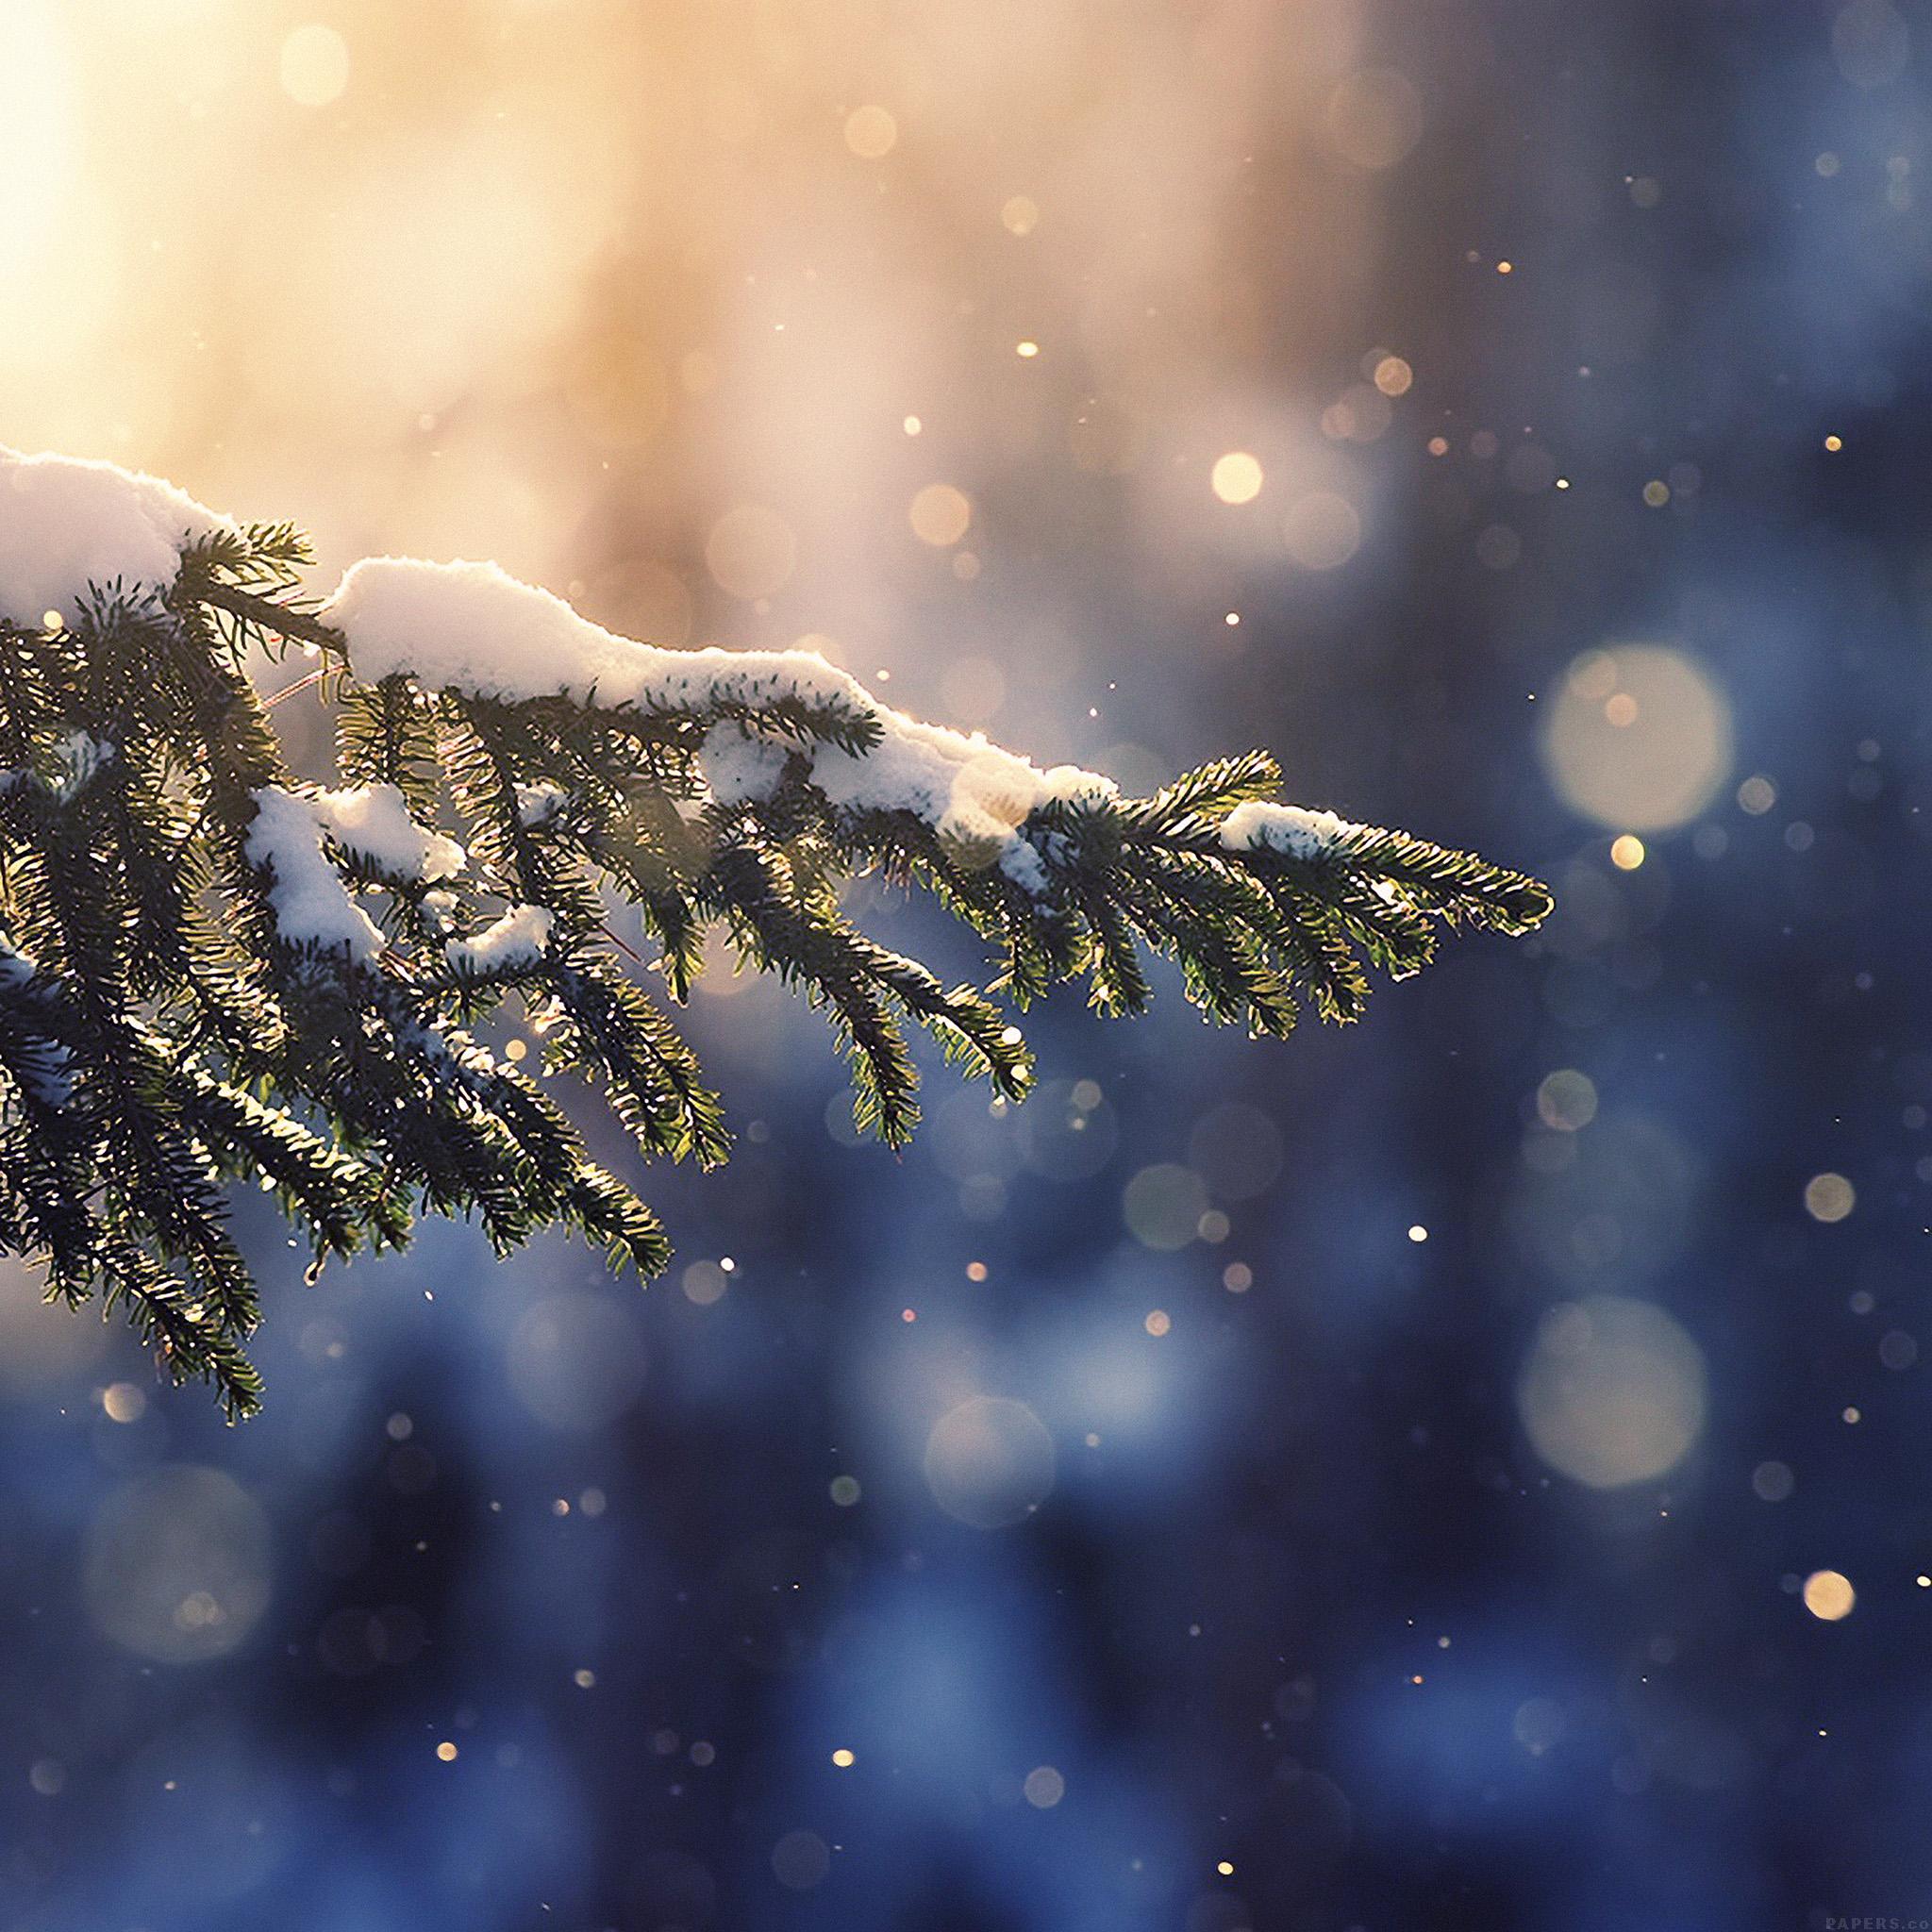 freeios8 | iphone wallpaper | mk28-snowing-tree-blue-christmas